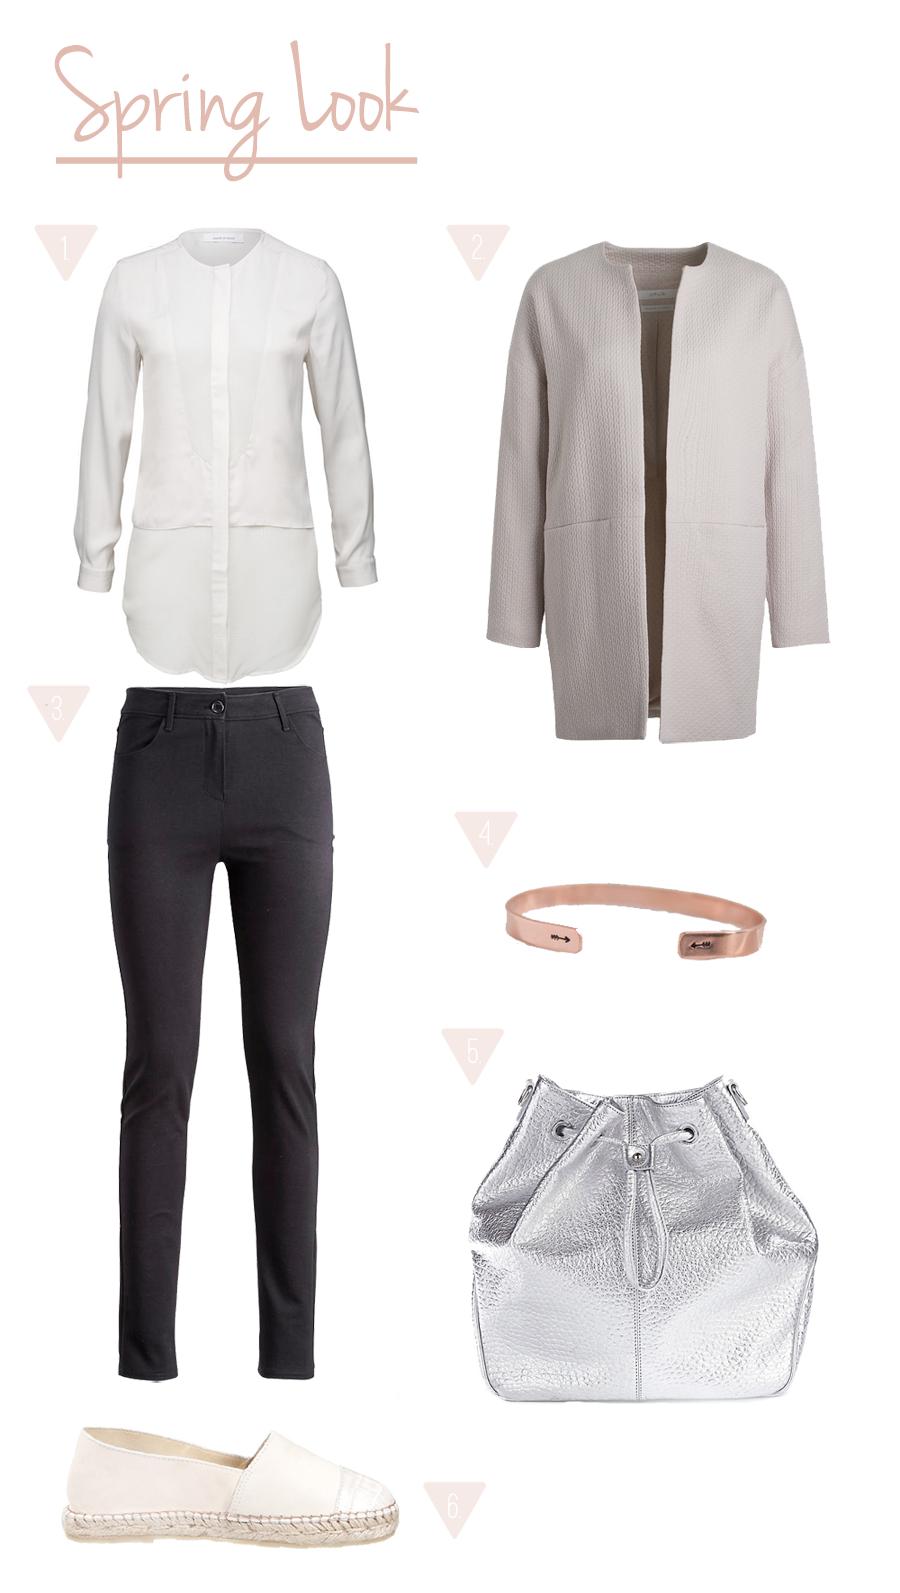 Spring Look Inspiration |Pixi mit Milch